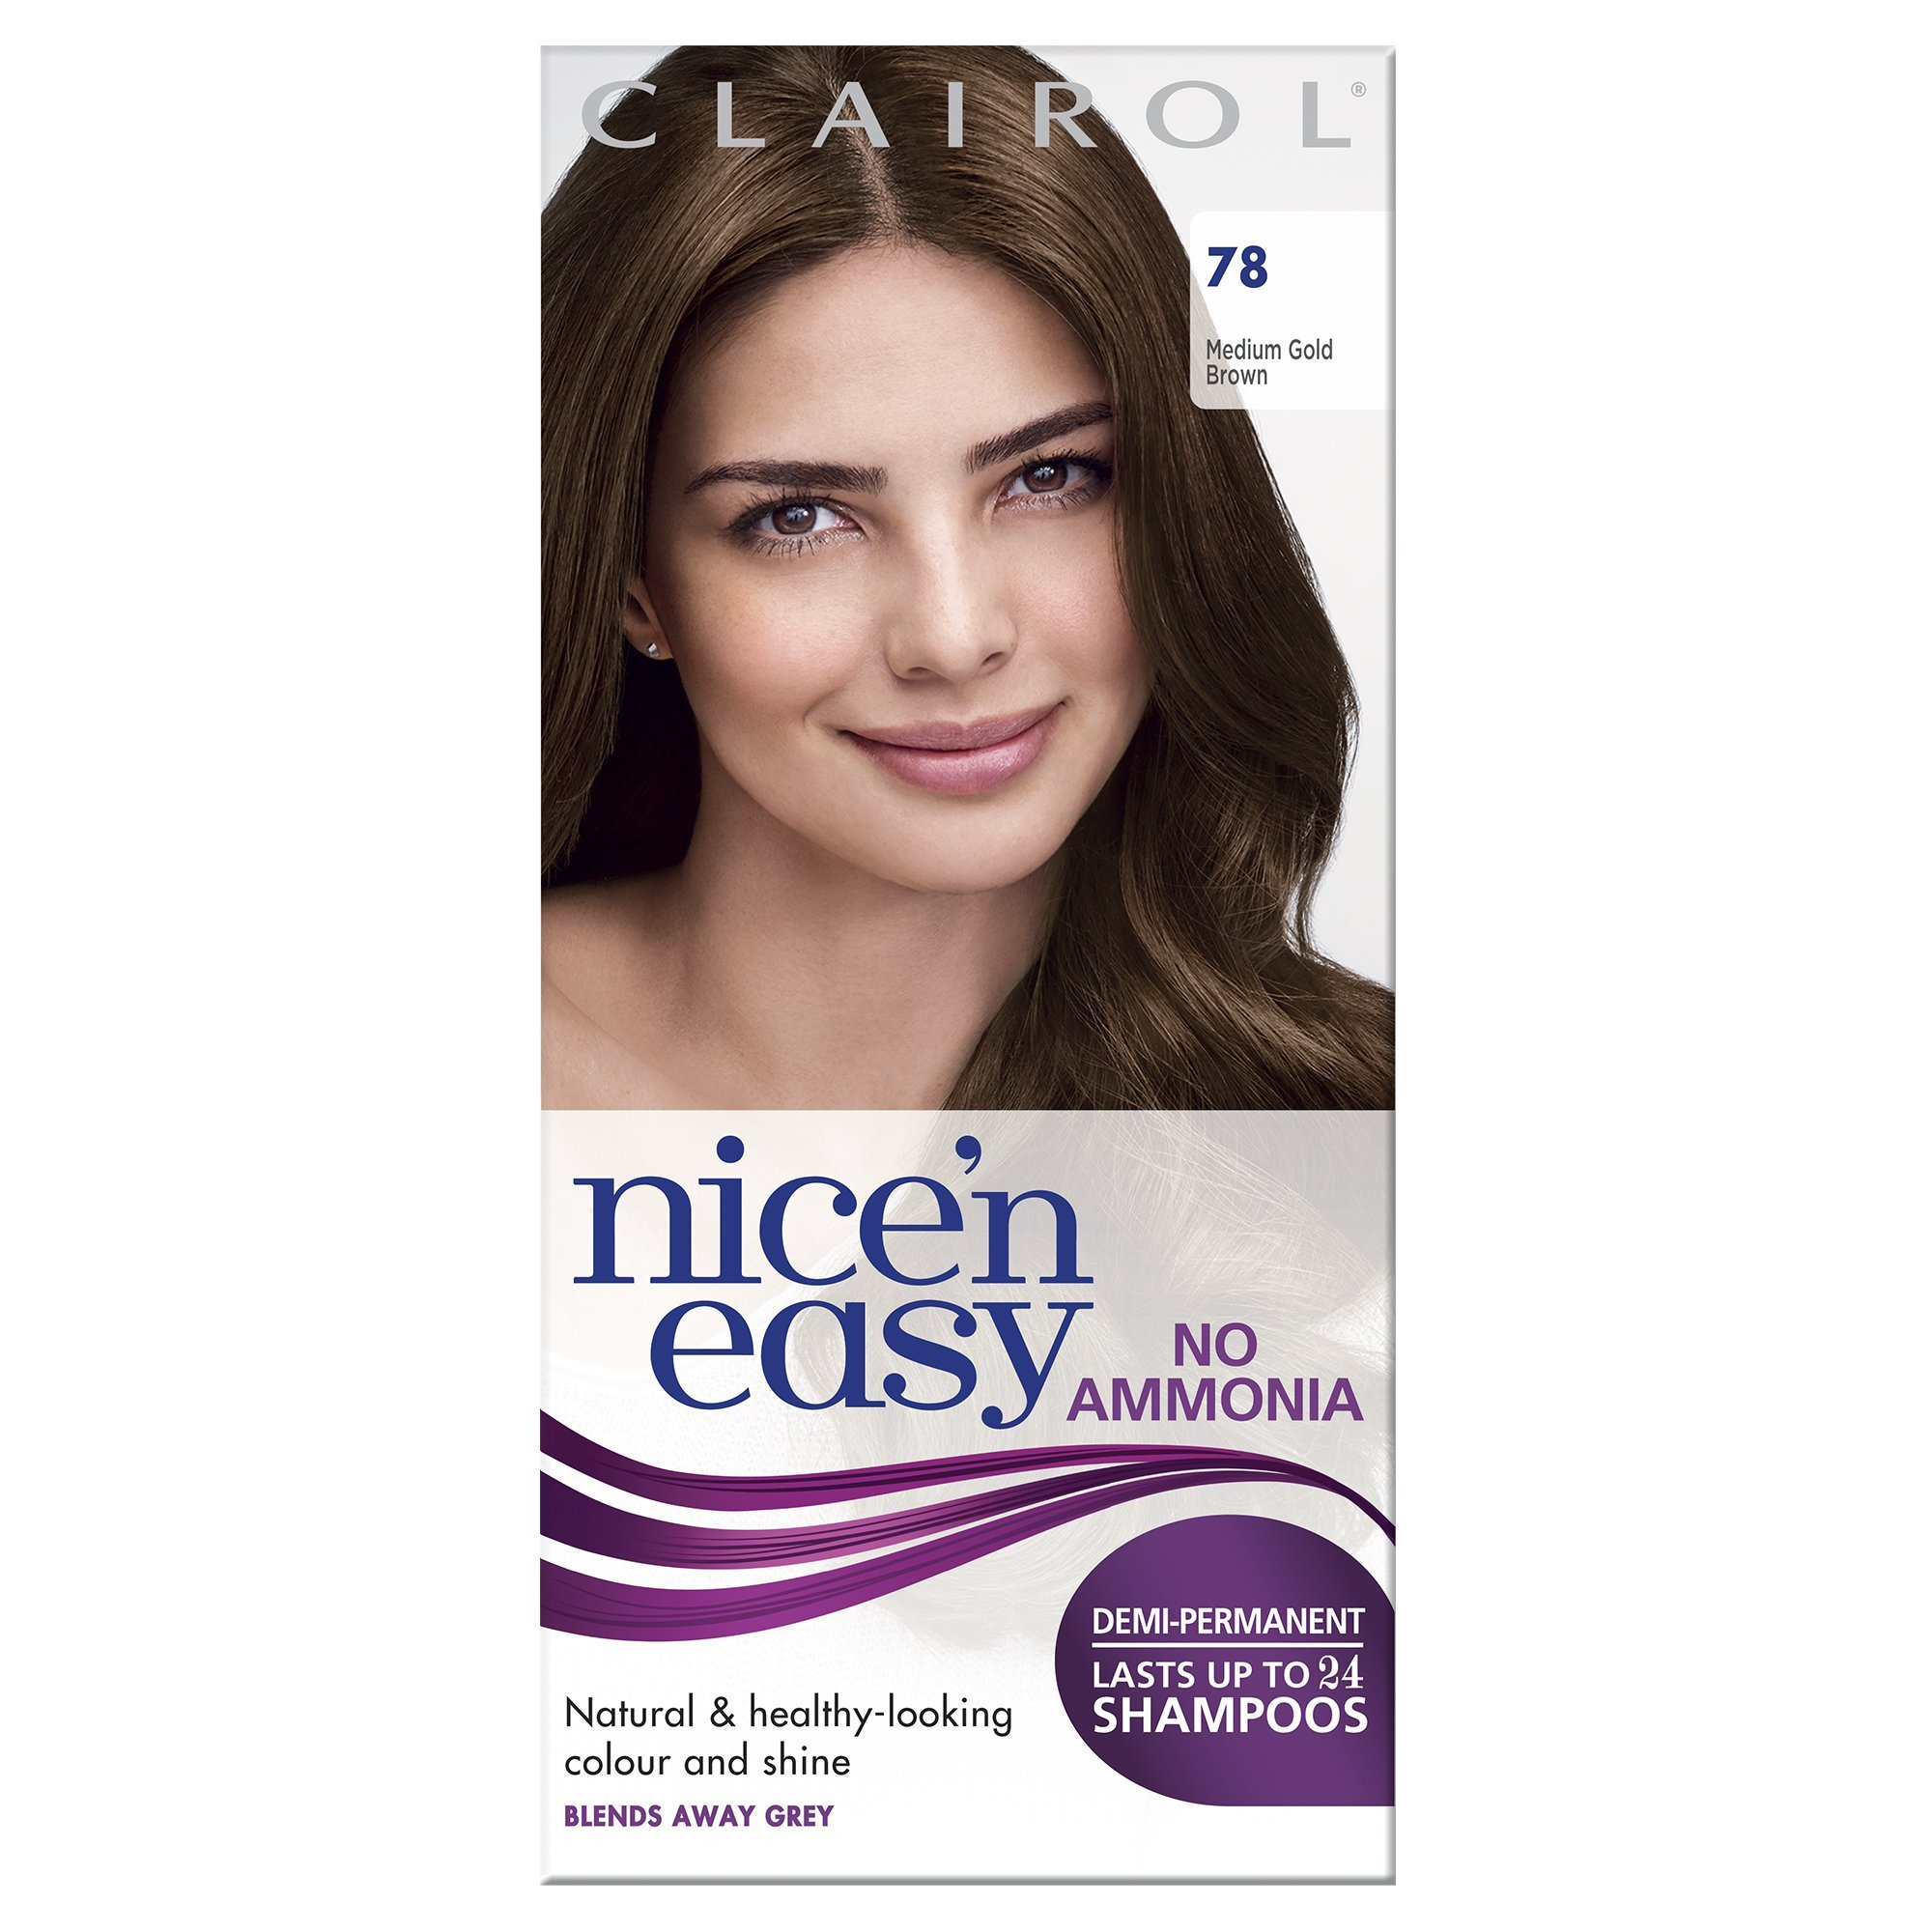 Clairol Nicen Easy Semi Permanent Hair Dye No Ammonia 78 Medium